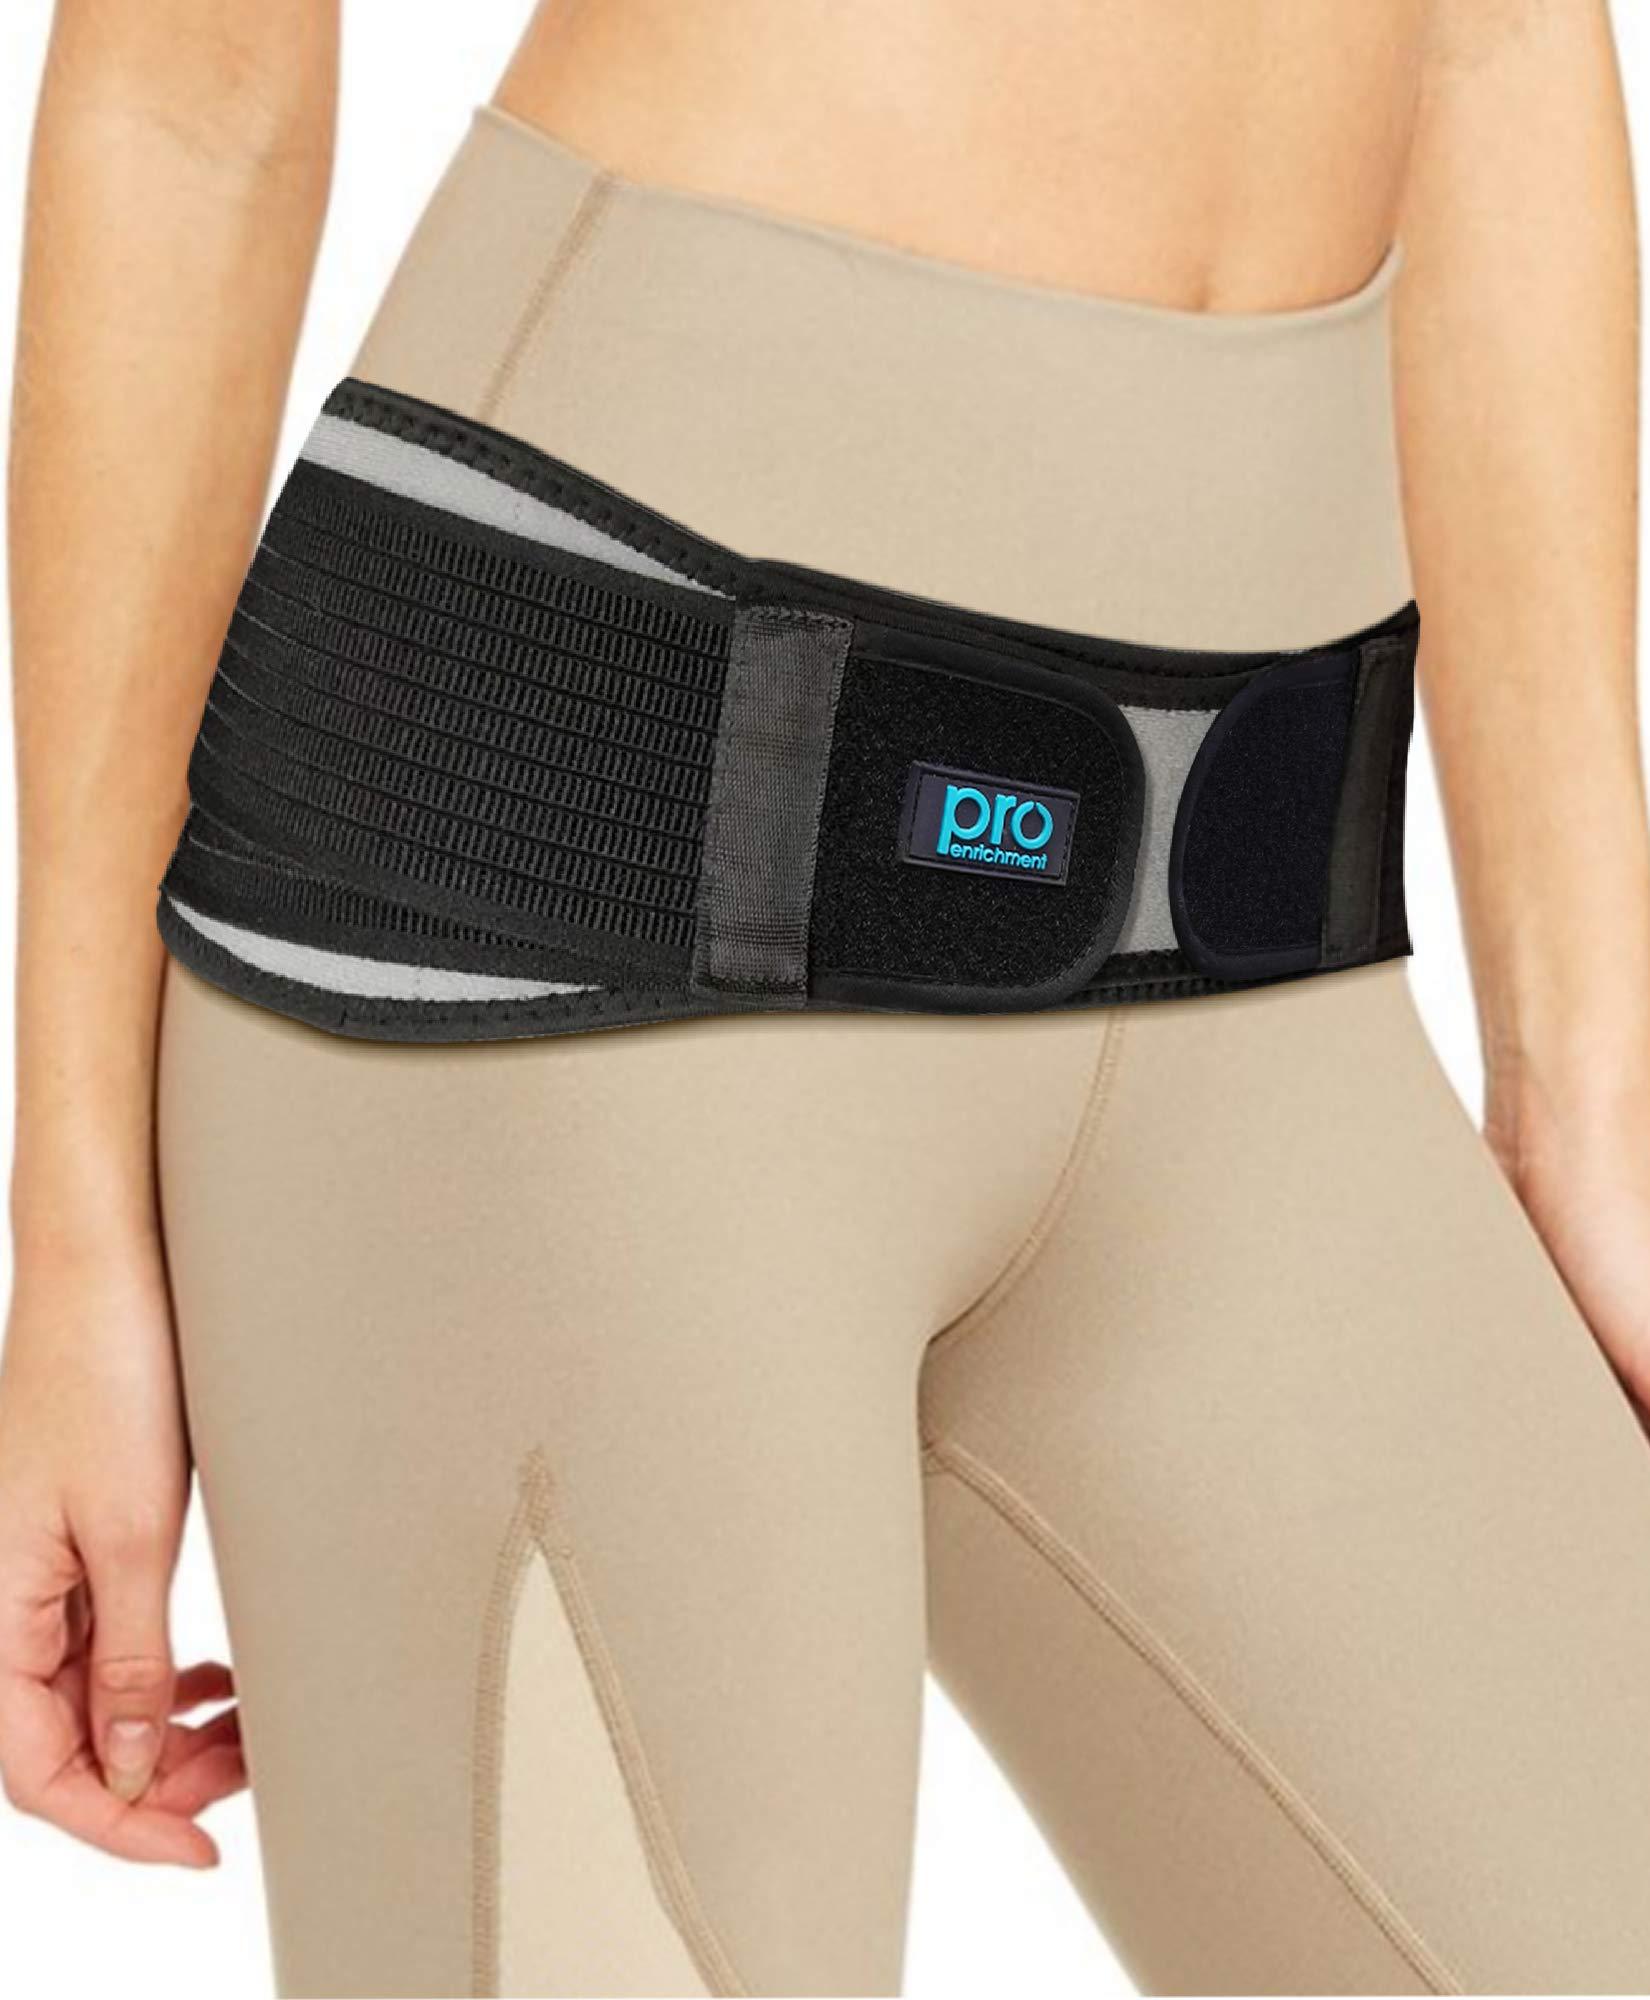 SI Belt Hip Brace for Men and Women That Treat Sciatica, Including Lower Back Support, Lumbar, Pelvic & Leg Pain Relief. Stabilize Sacroiliac SI Joint. Anti-Slip Sciatic Nerve Braces (Regular Size)